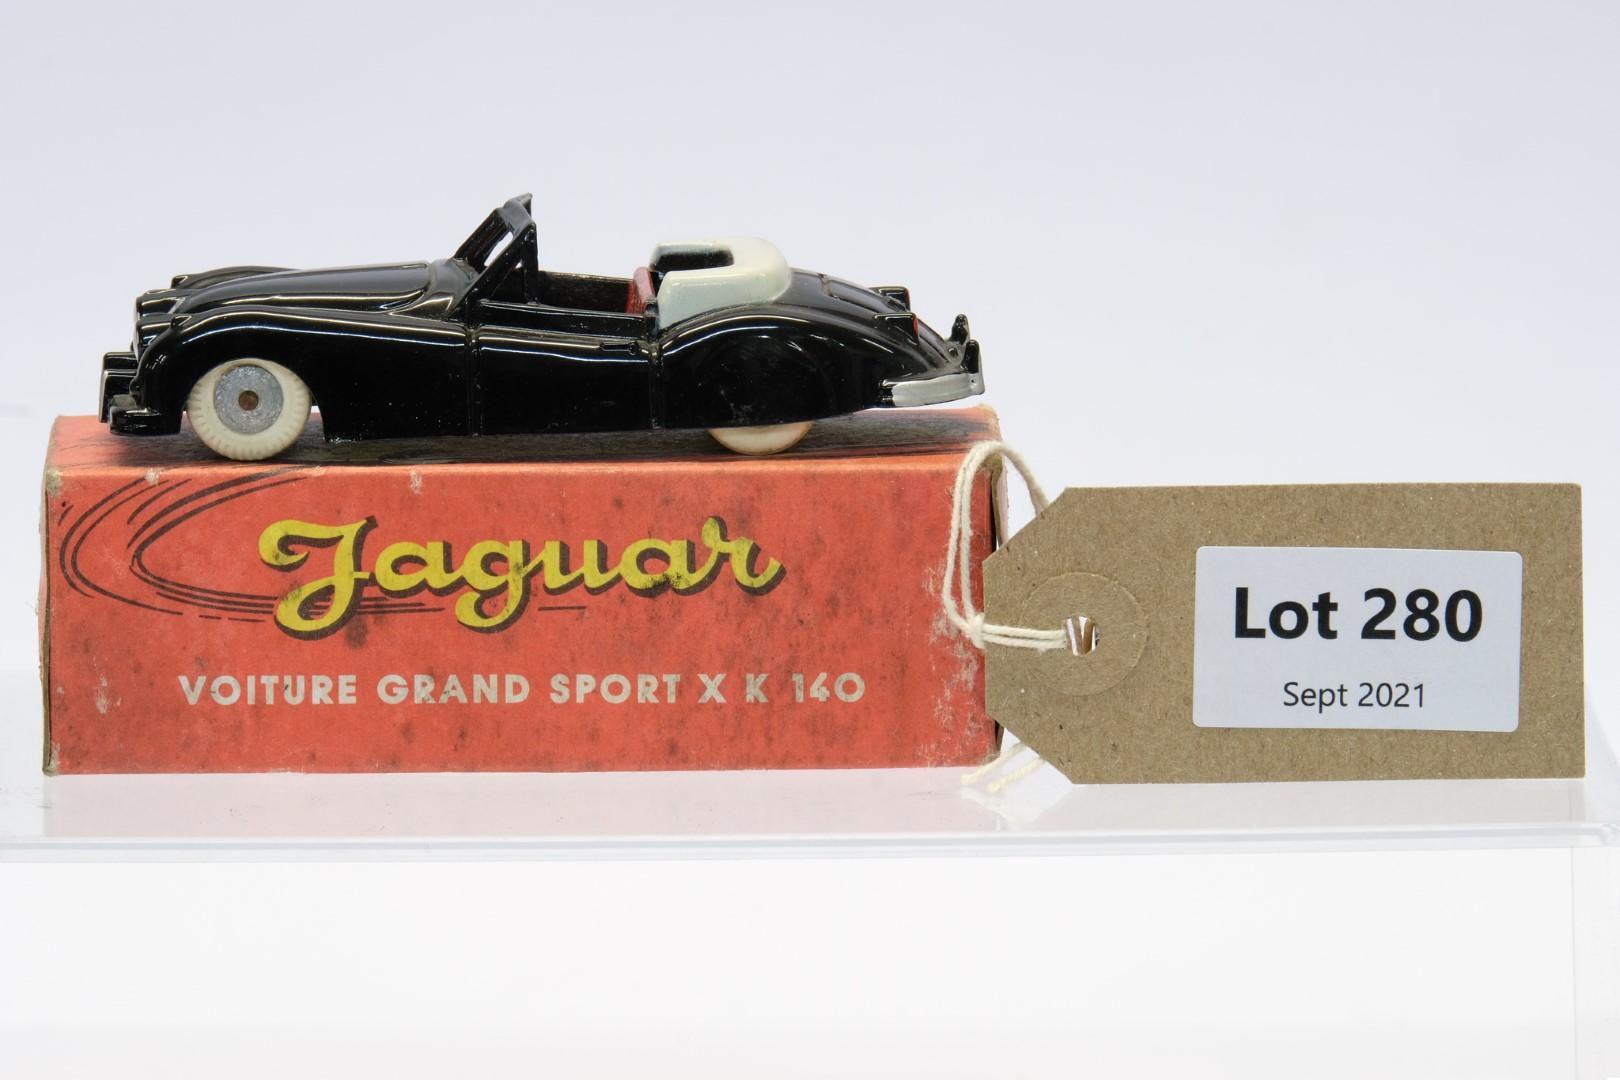 Quiralu Jaguar Voiture Grand Sport XK140 Black